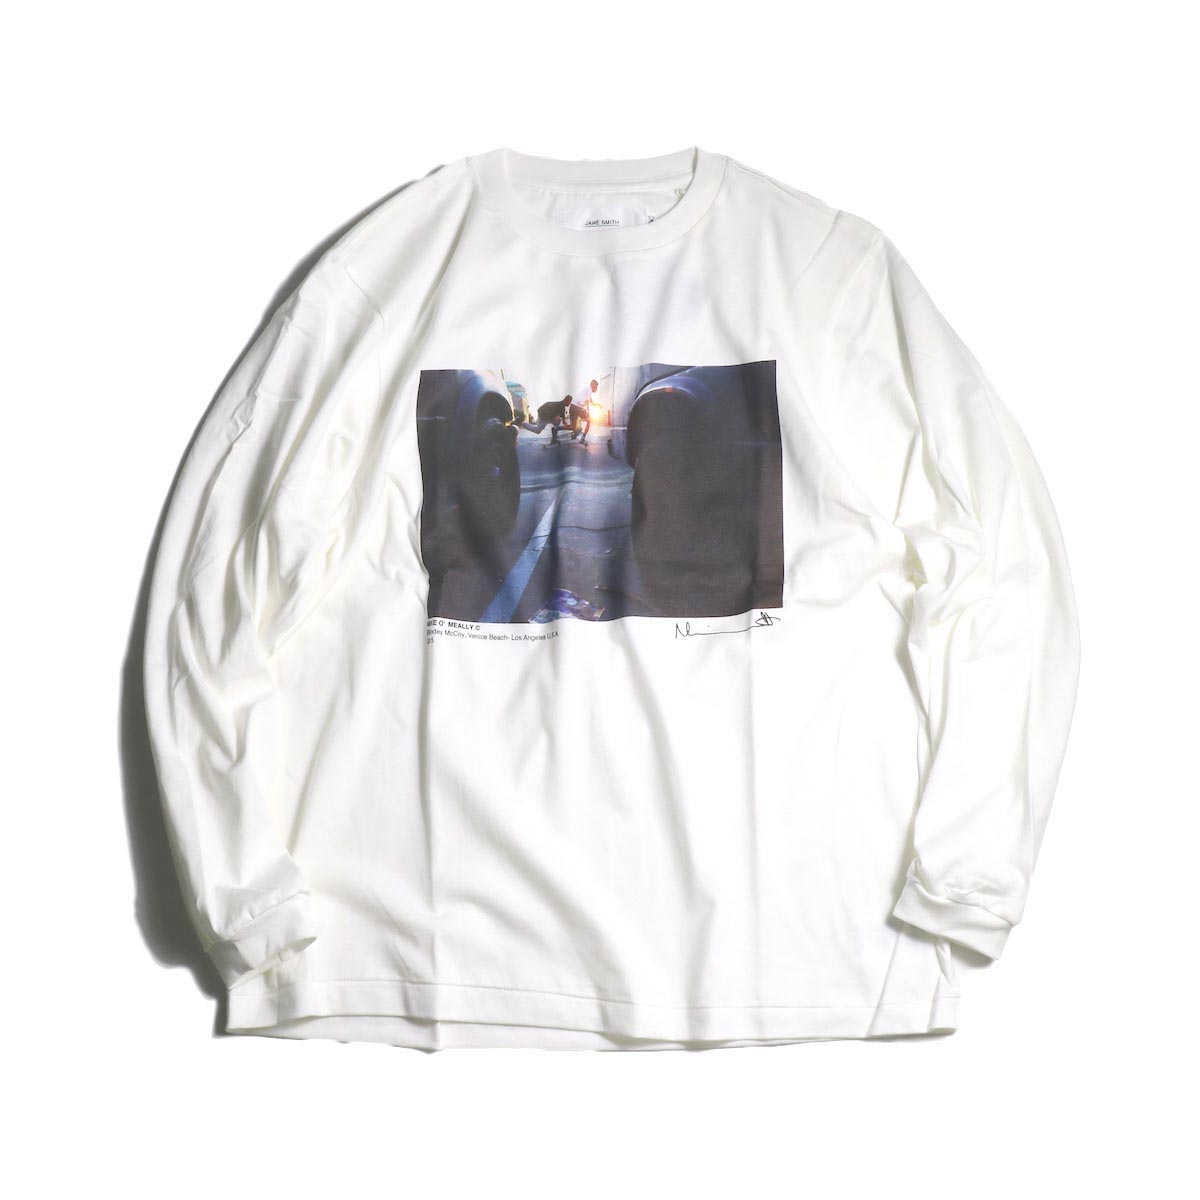 JANE SMITH / Print Tee (BLONDEY MCCOY L/S) -White